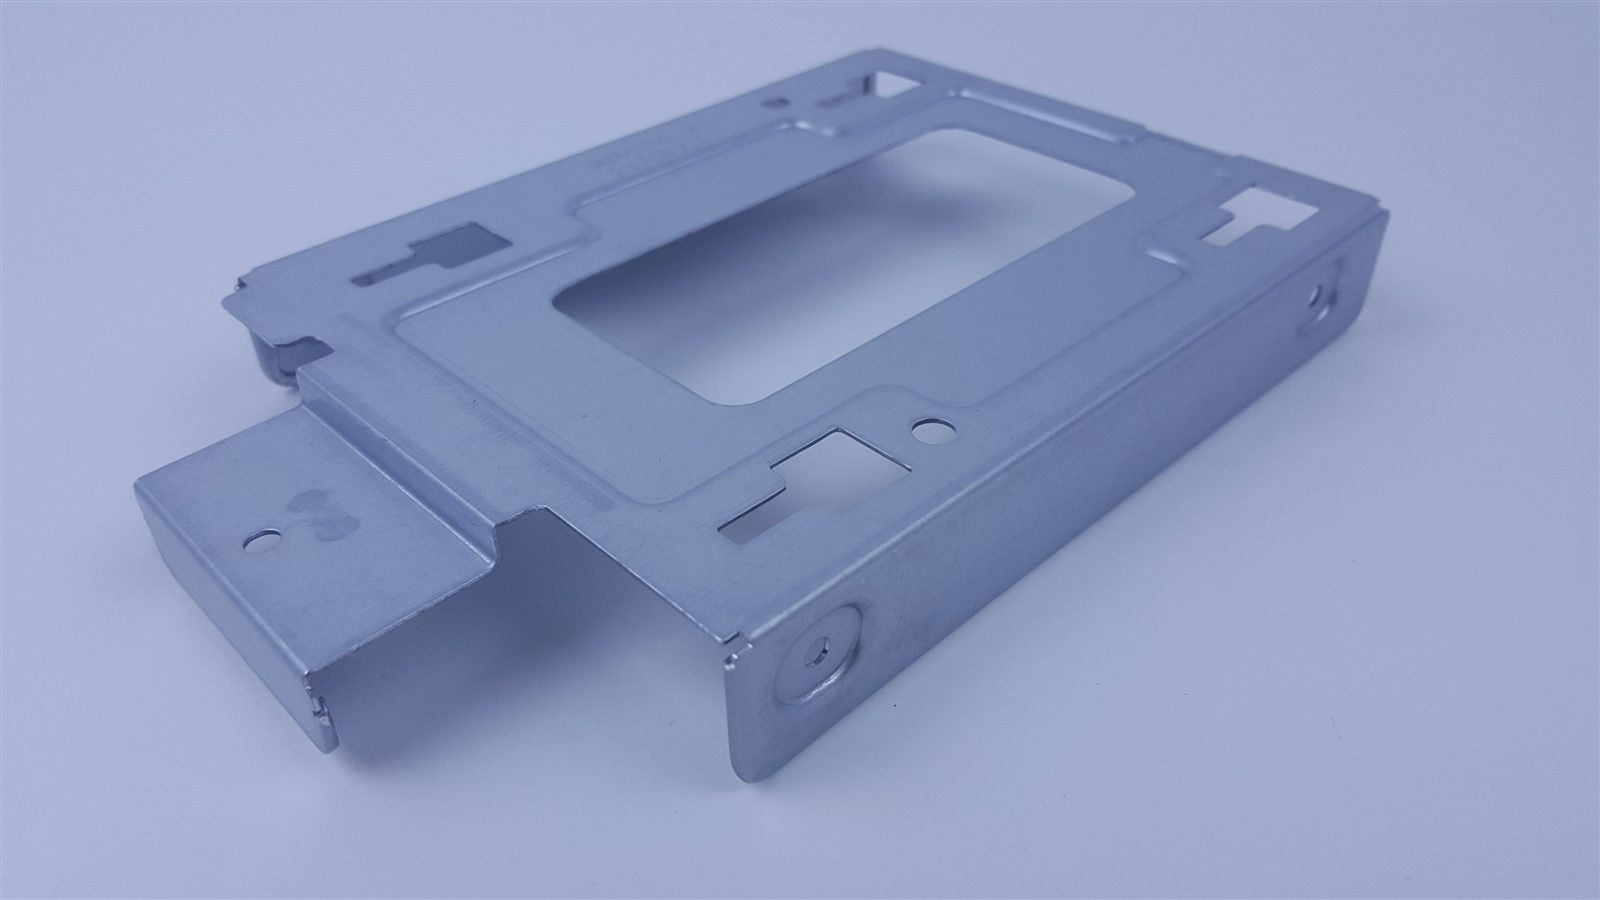 VR Assets > Dell Alienware 51 X51 R1 R2 R3 Desktop Hard Drive HDD ...